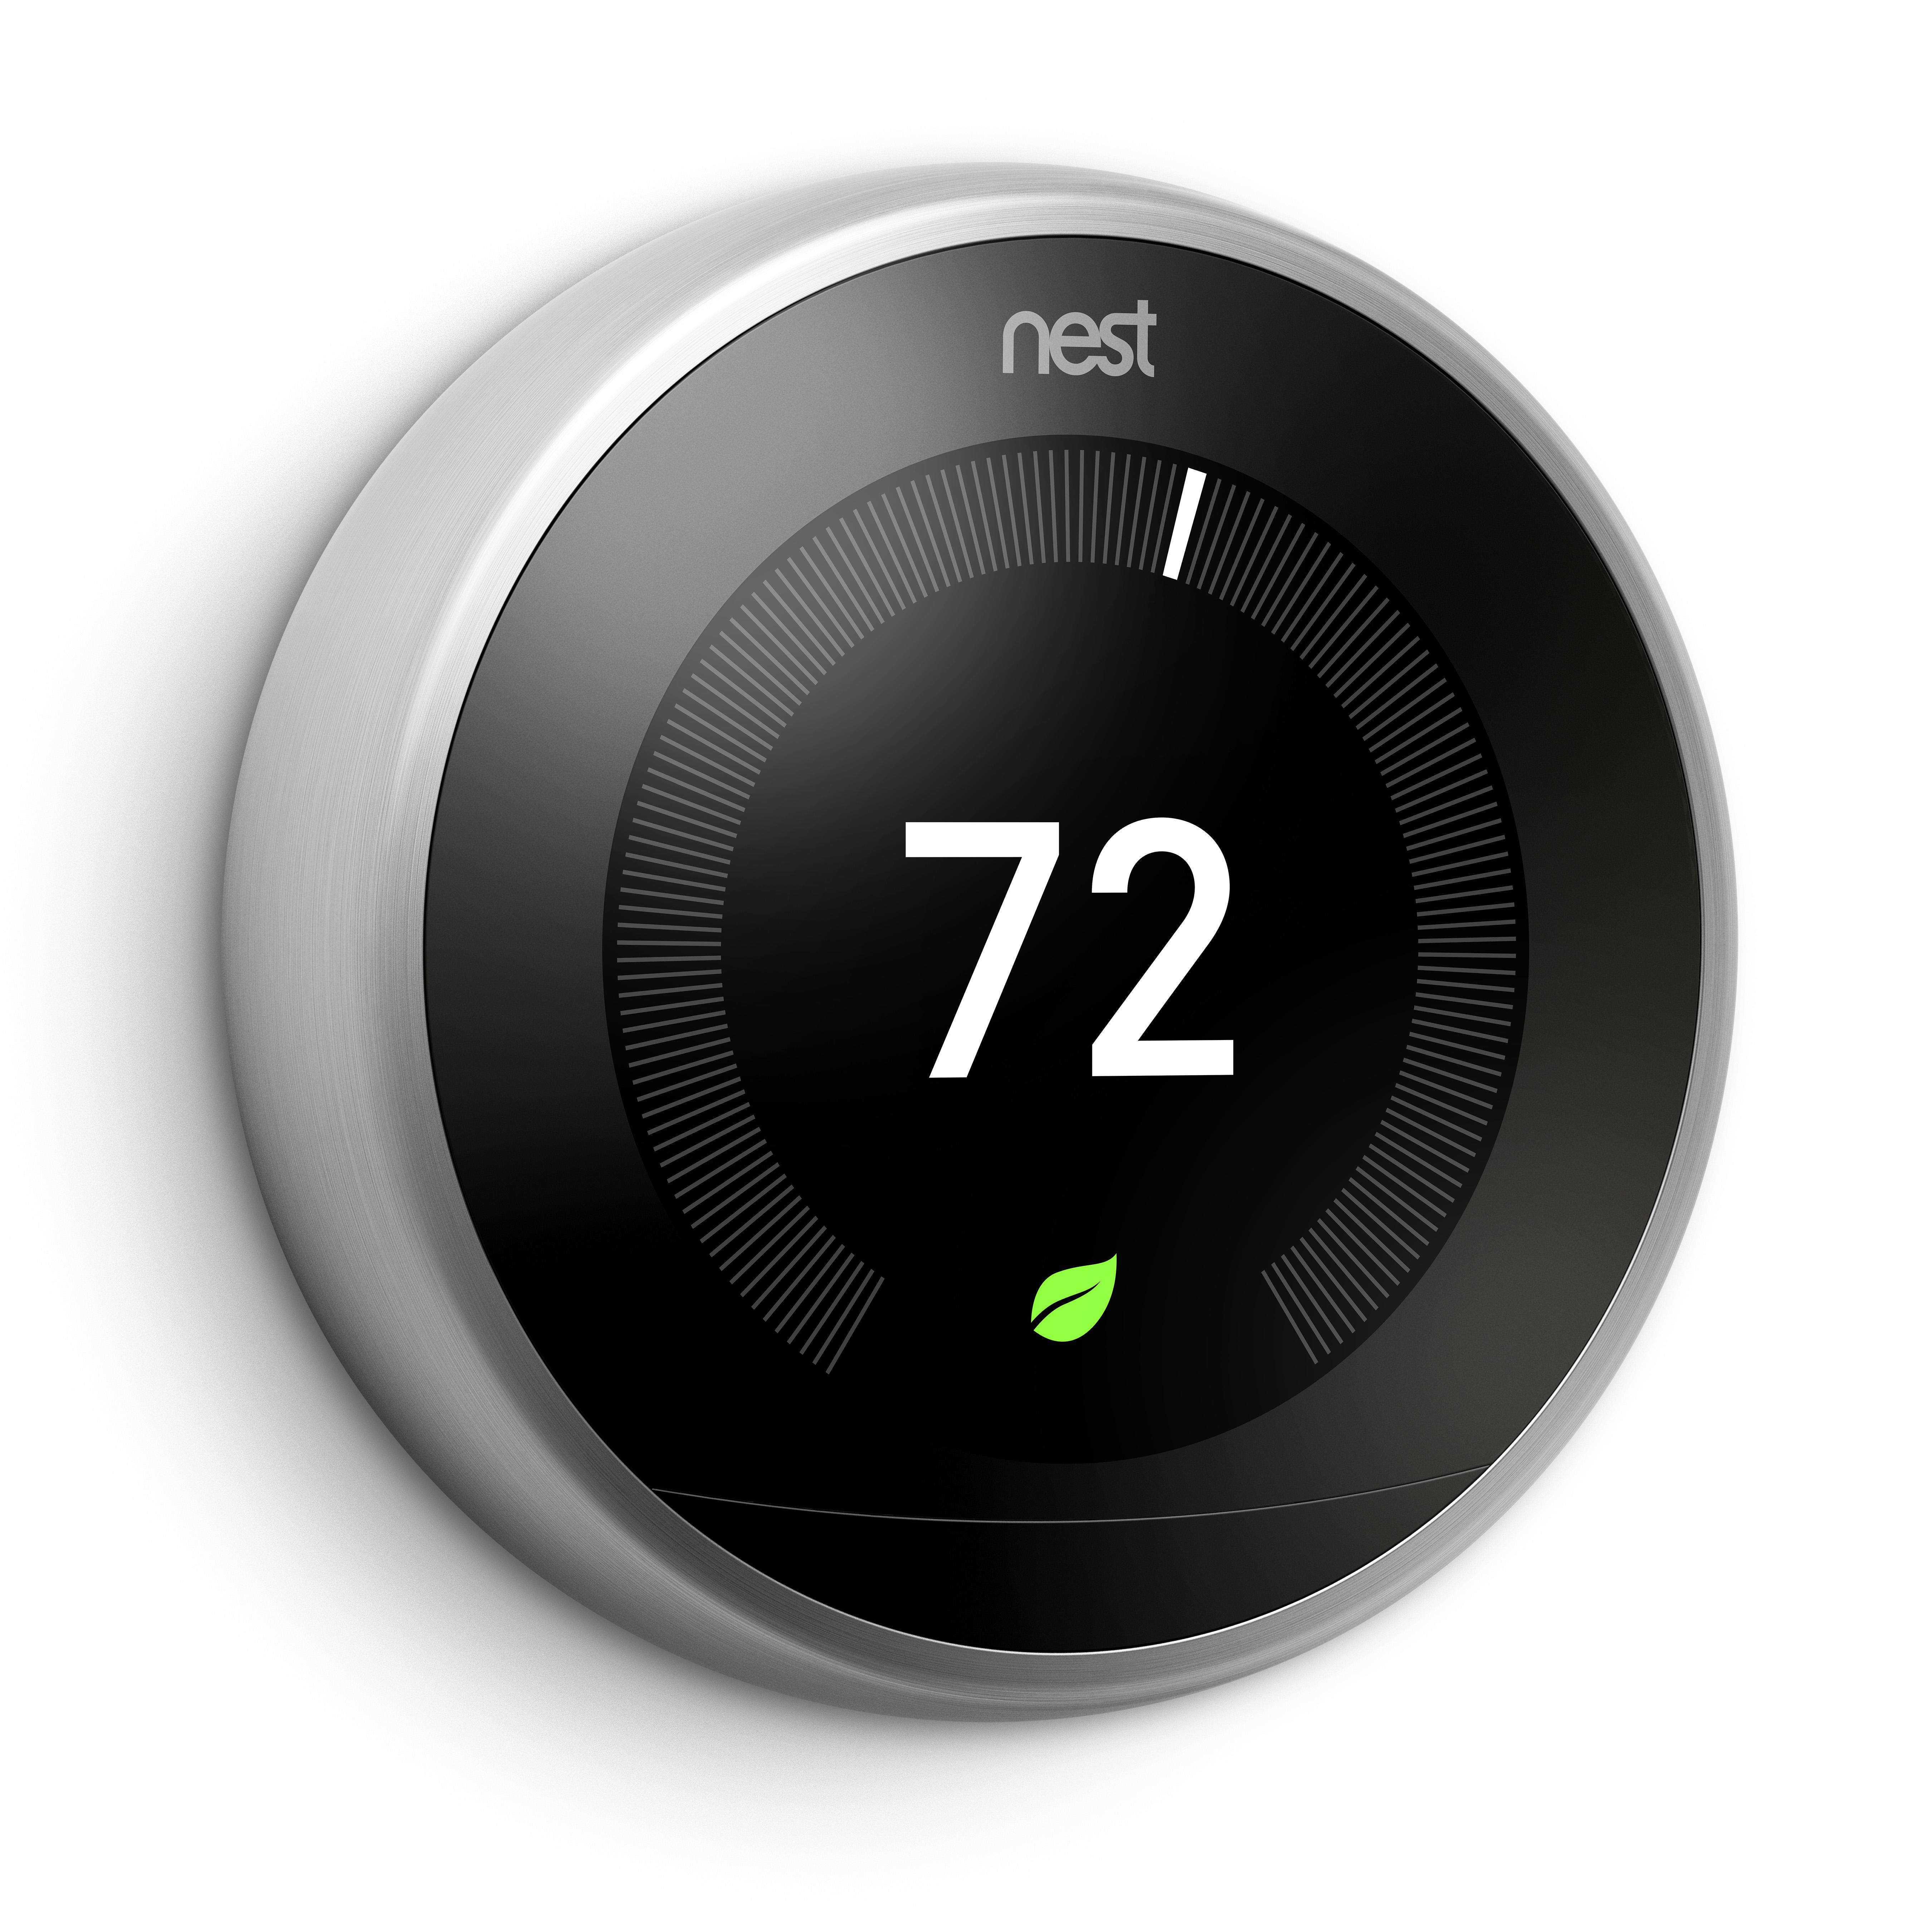 iot-nest-thermostat